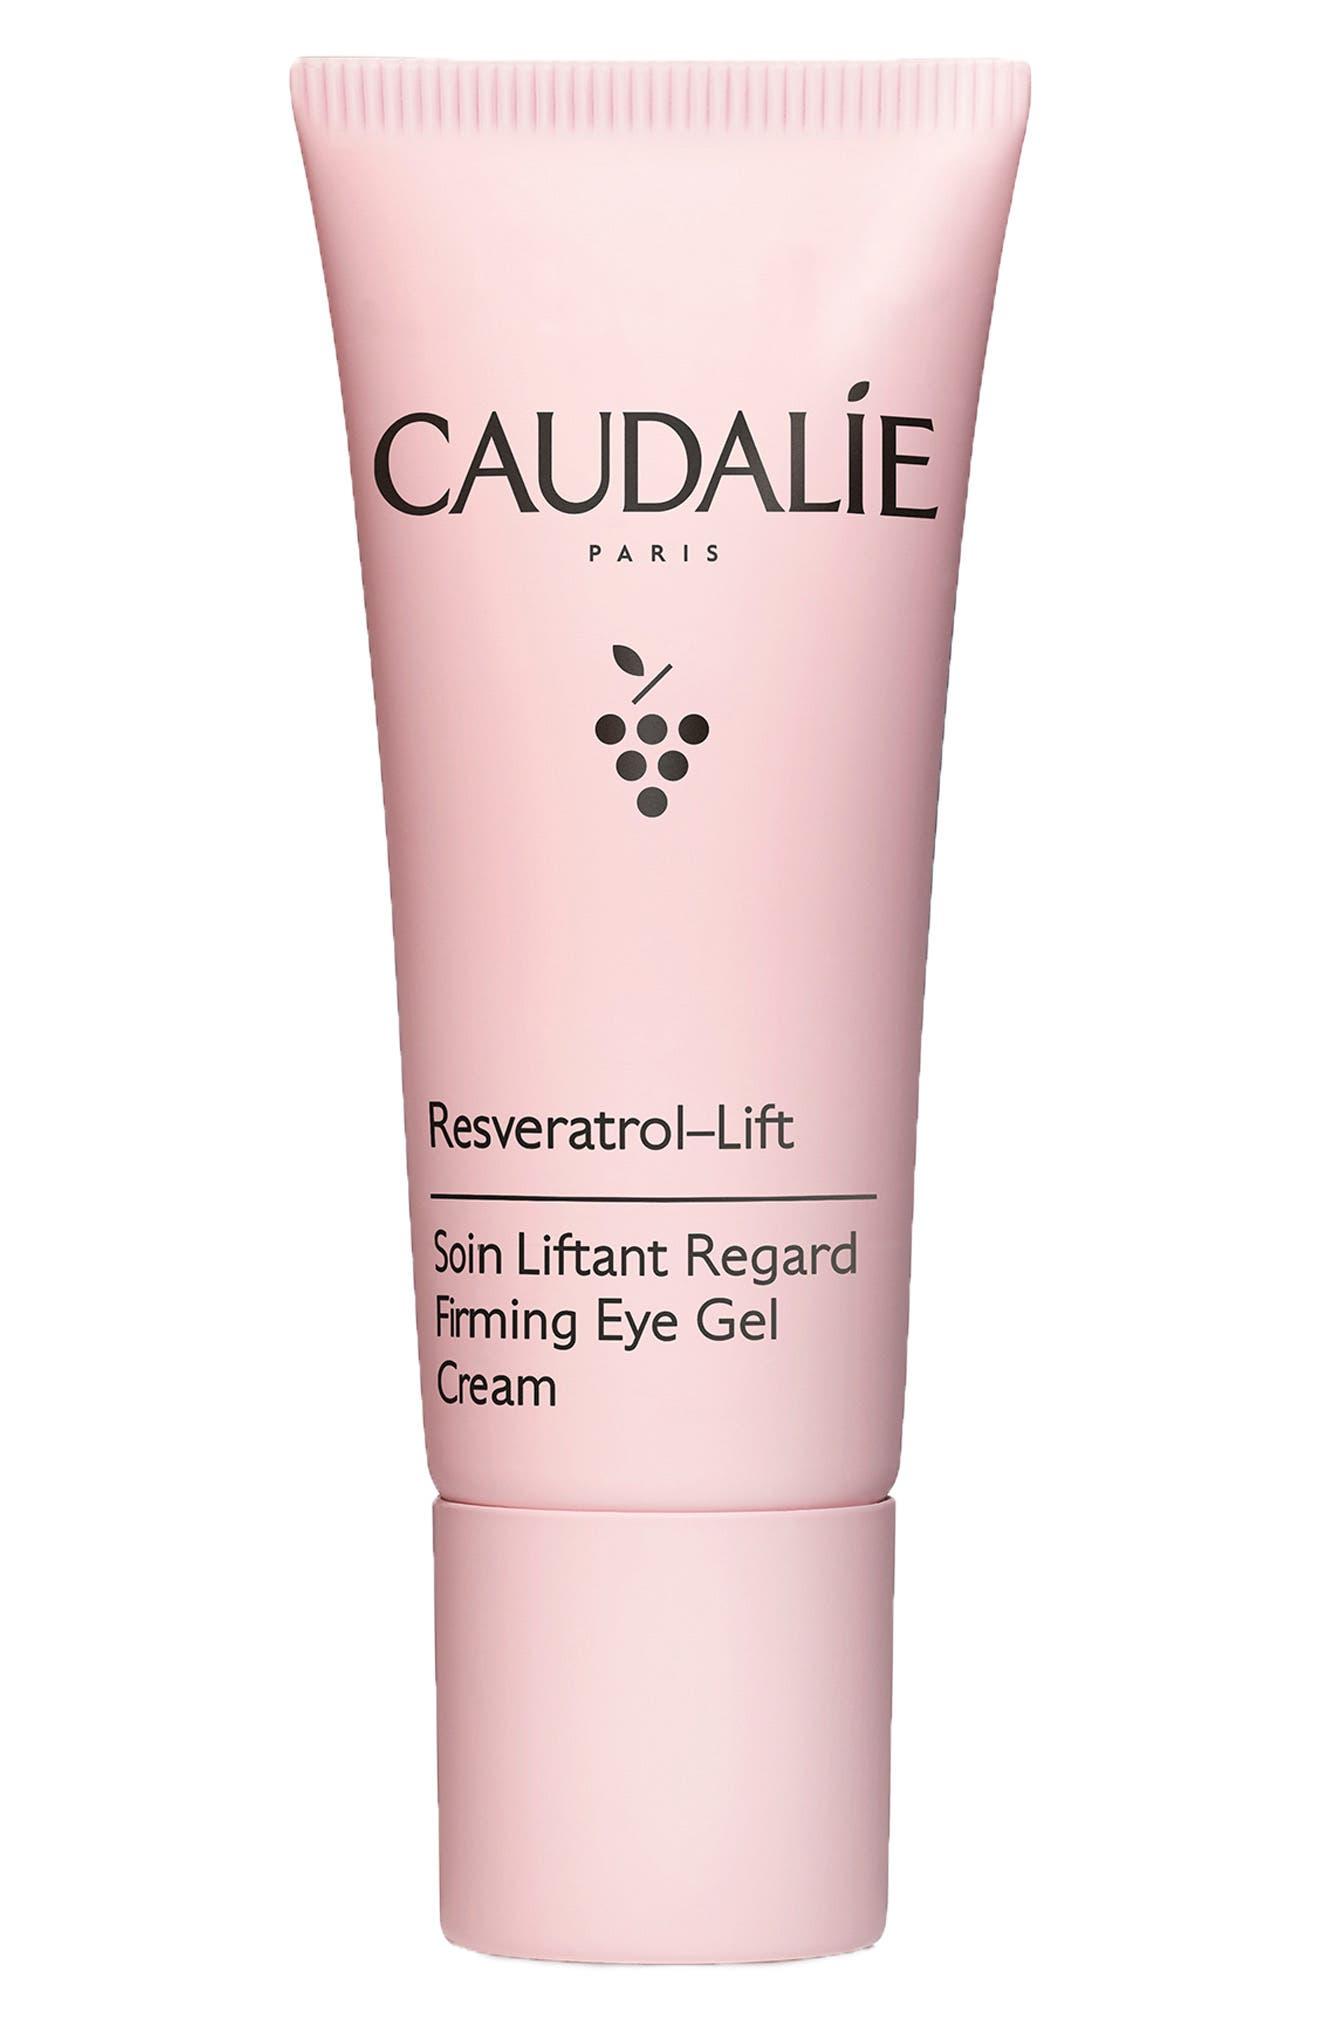 Resveratrol-Lift Eye Firming Gel Cream